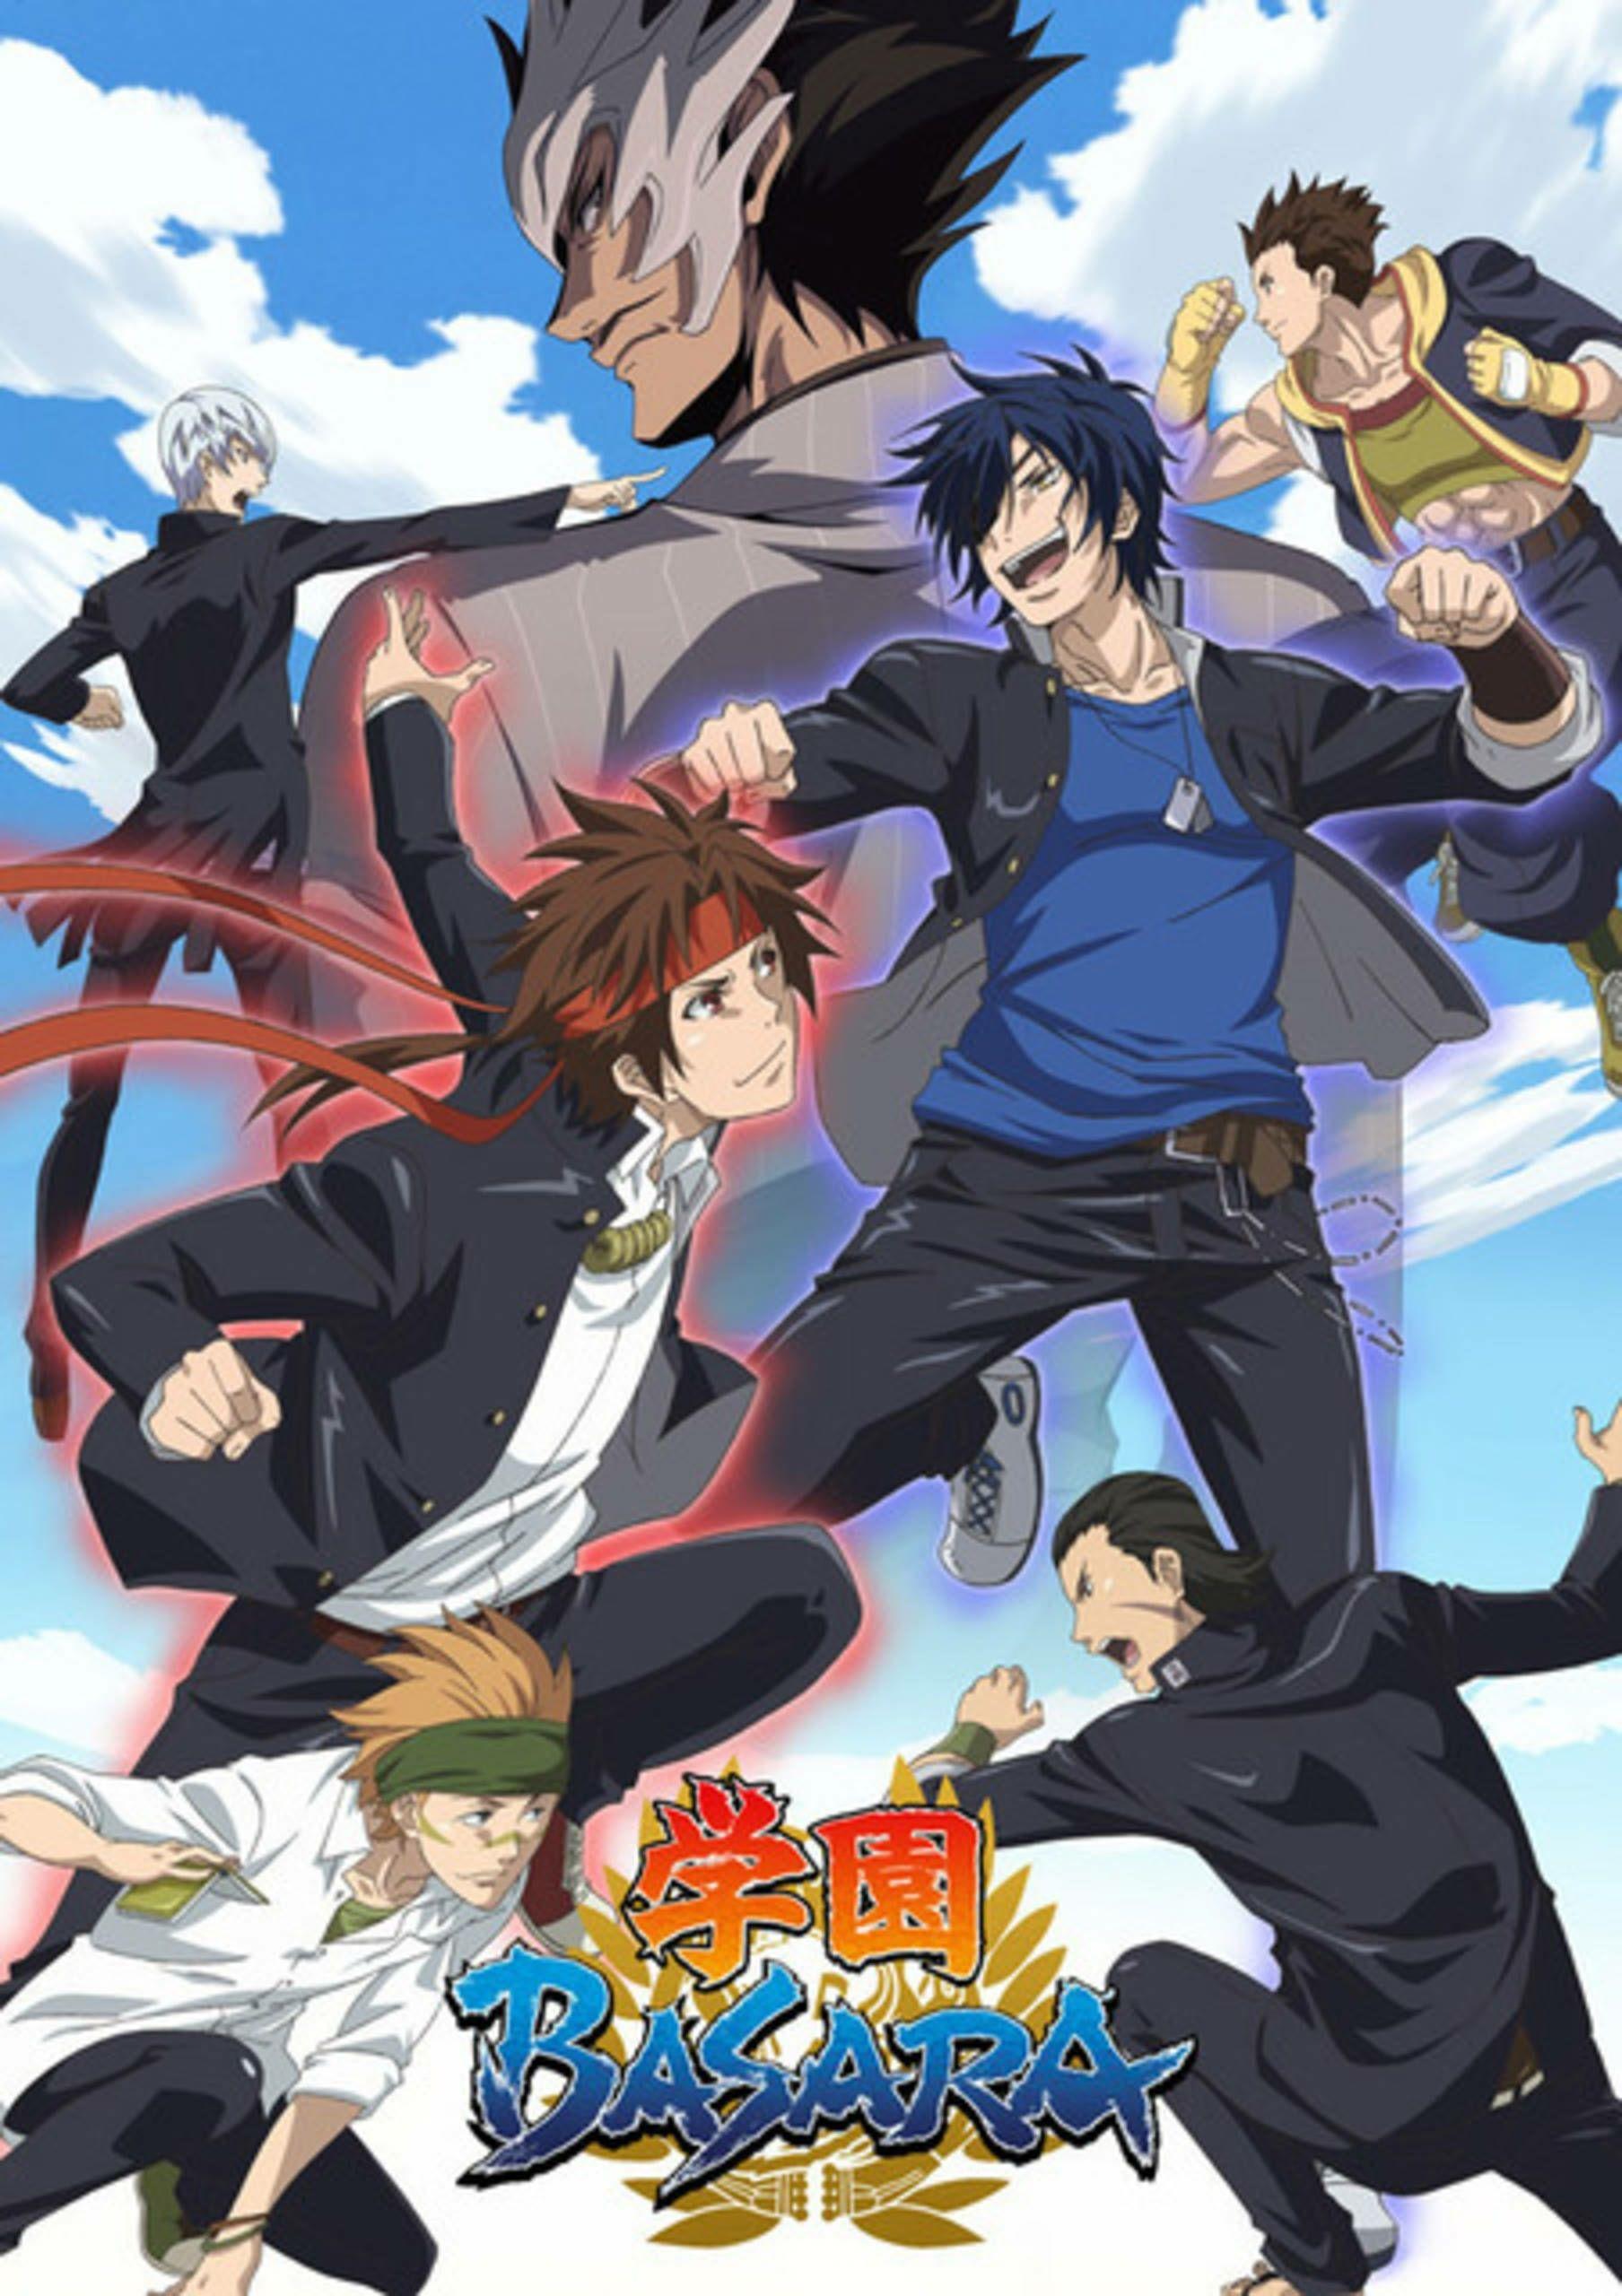 The post Gakuen Basara 01 12 appeared first on Erai